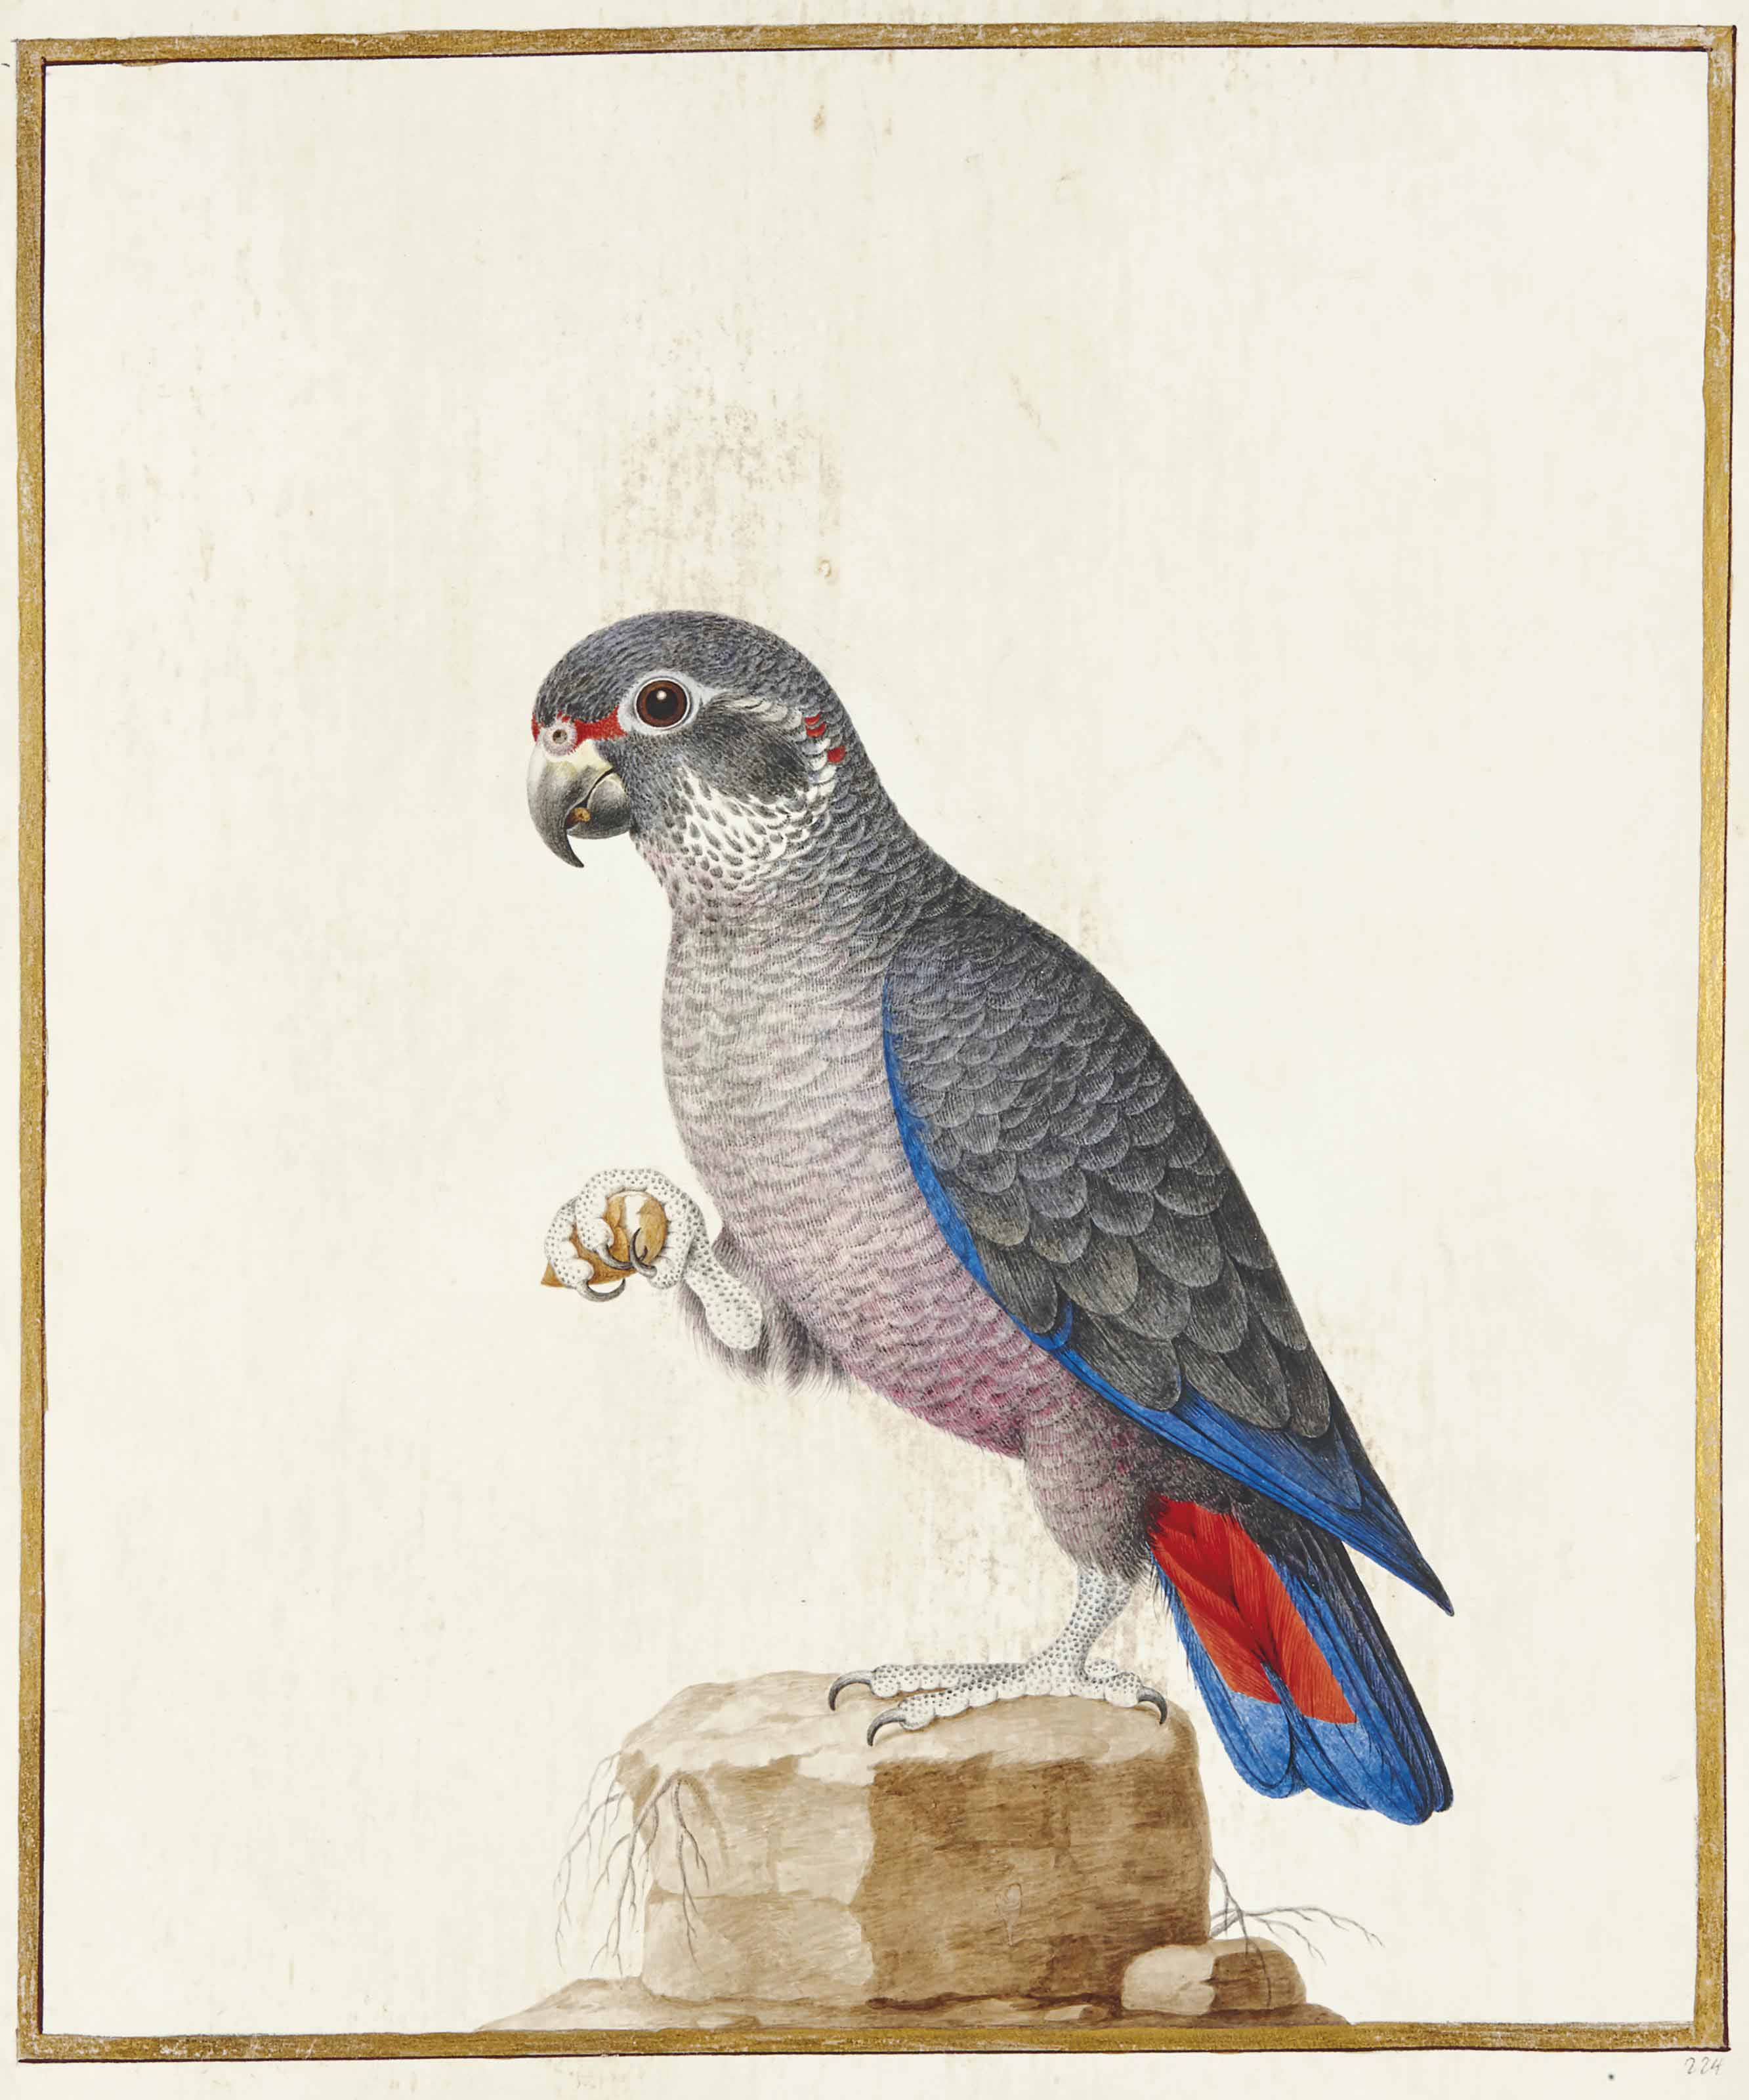 NICOLAS ROBERT (ORLÉANS 1614-1